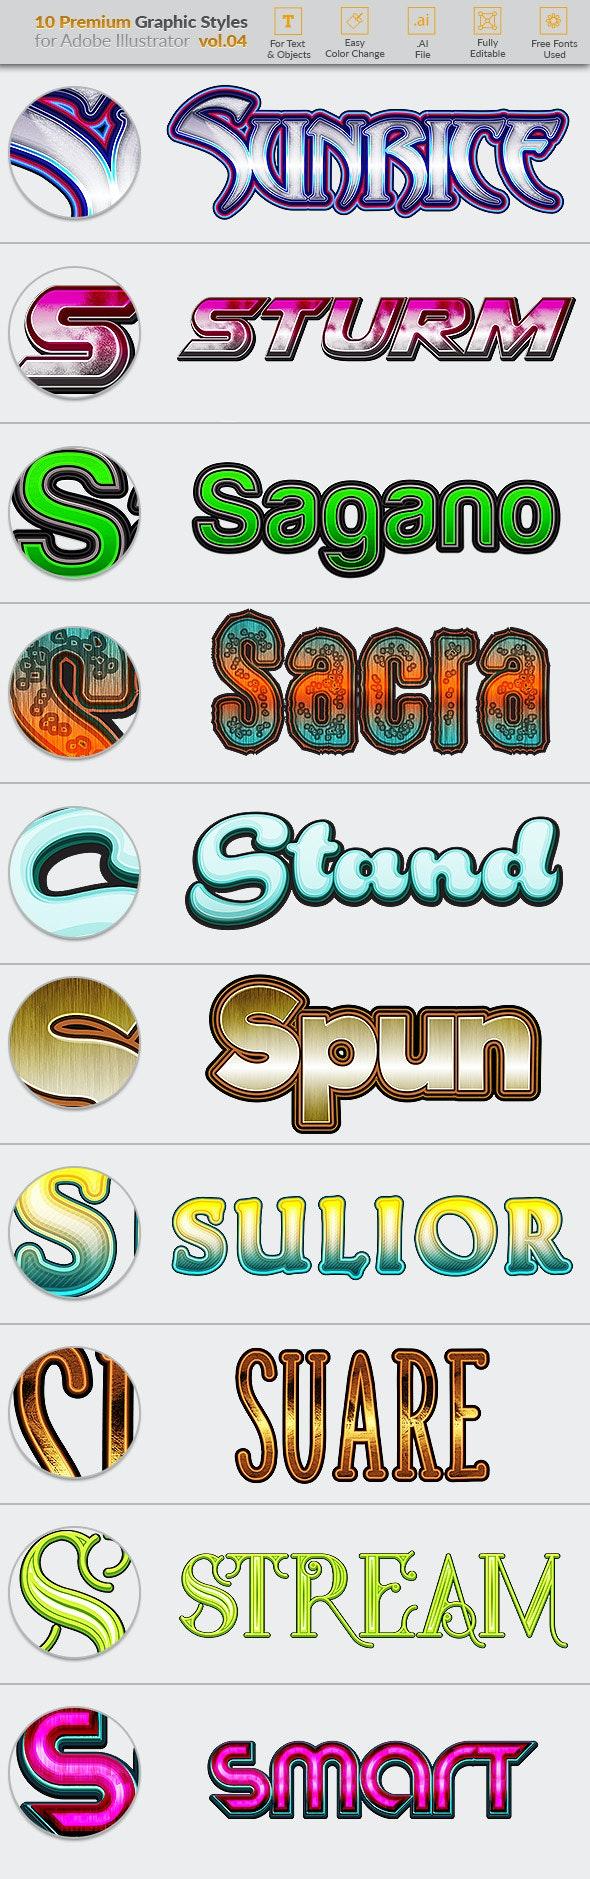 10 Premium Graphic Styles for Illustrator Vol. 04 - Styles Illustrator